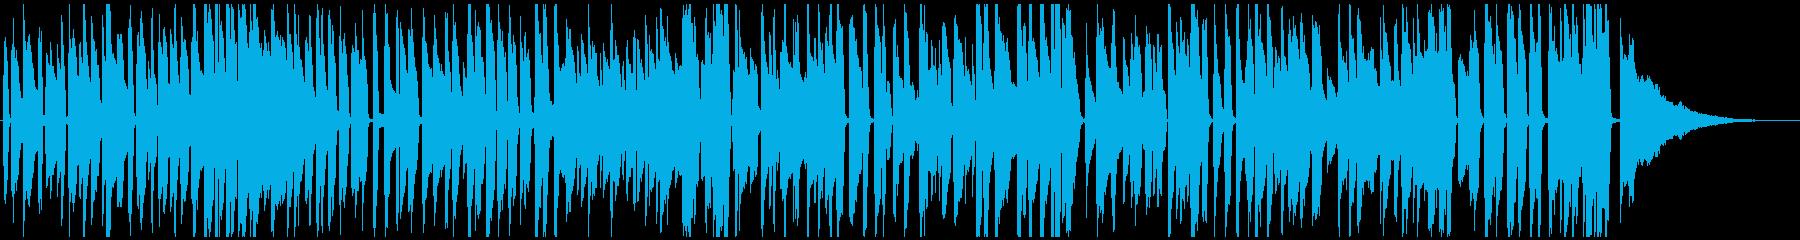 YouTube系ピアノジャズ 料理映像等の再生済みの波形